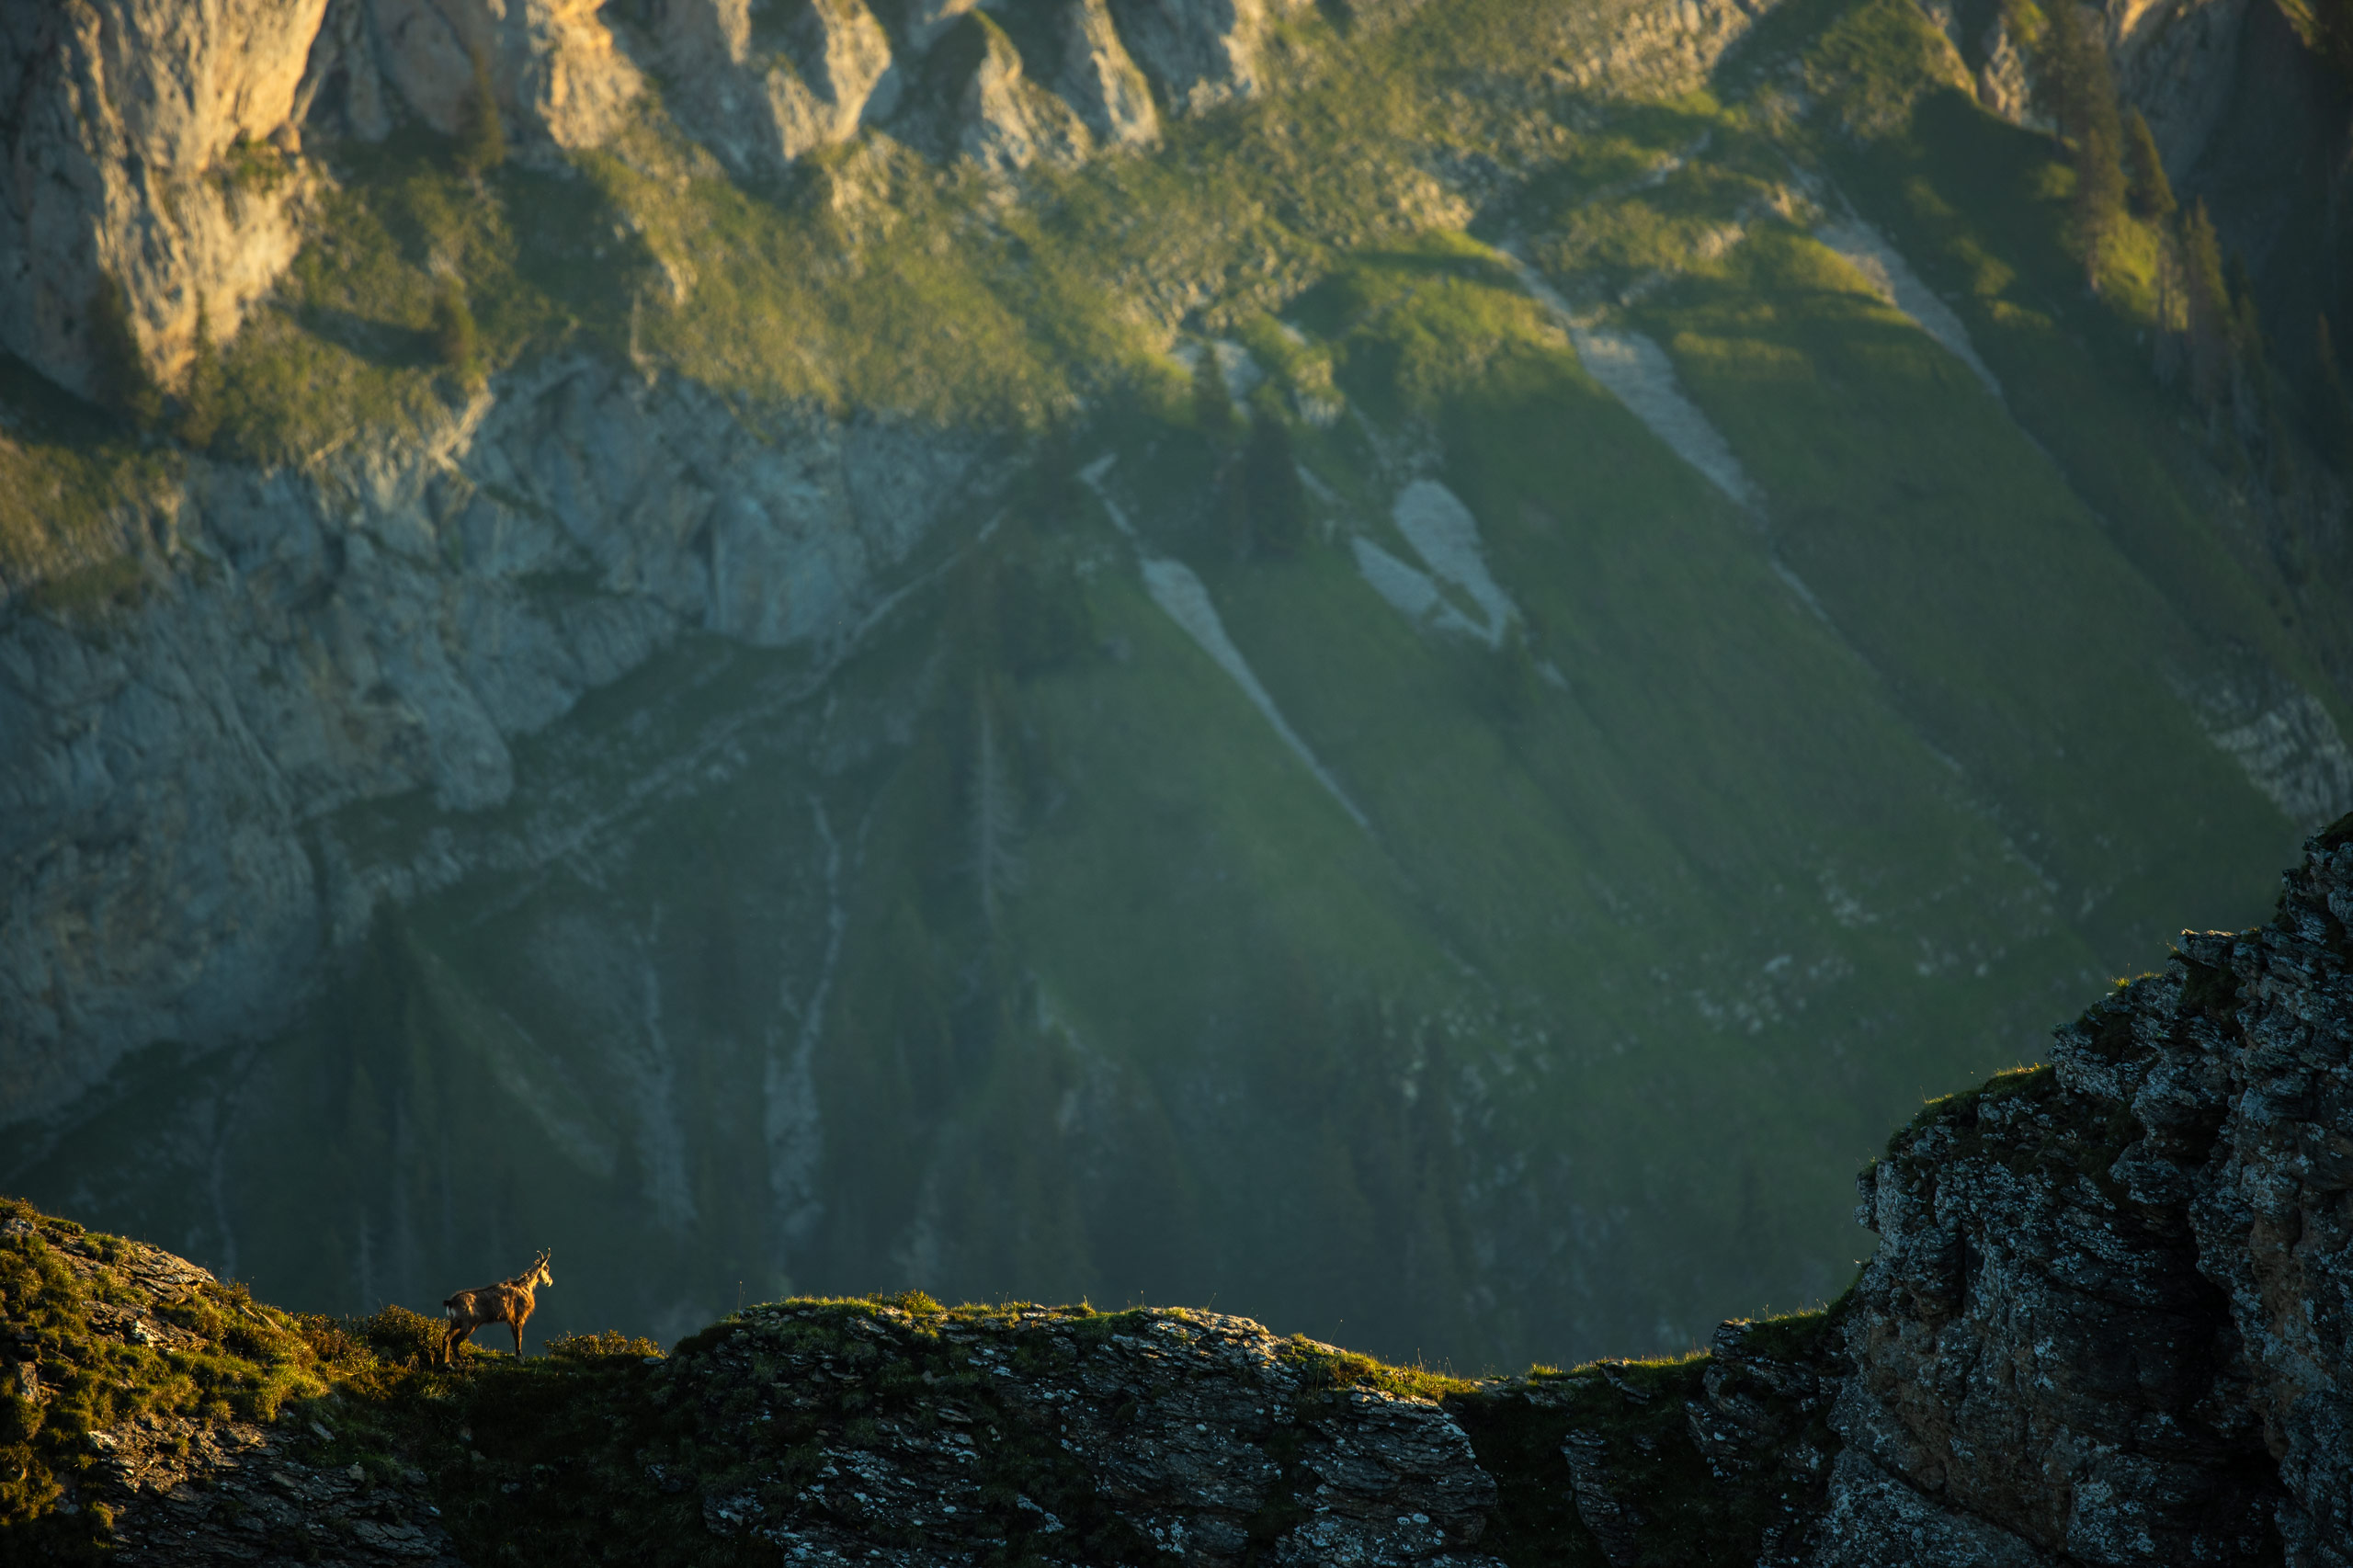 Tom_Schueler_Fotografie_Wildlife_Mammals_16